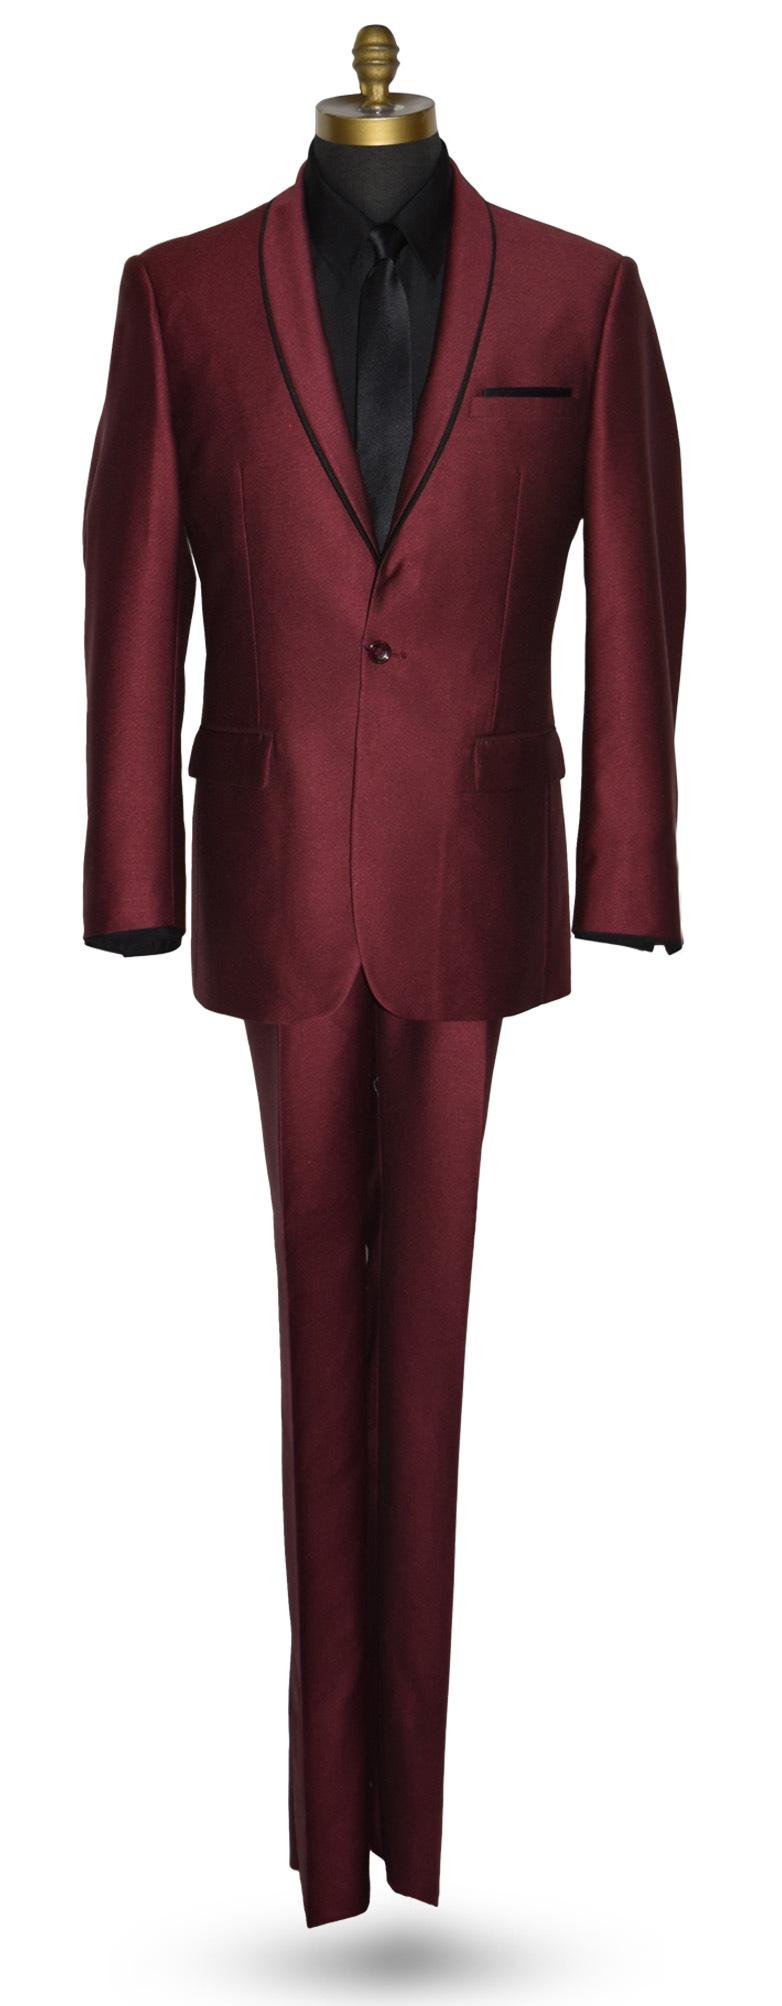 Burgundy Tuxedo Coat and Pants Set